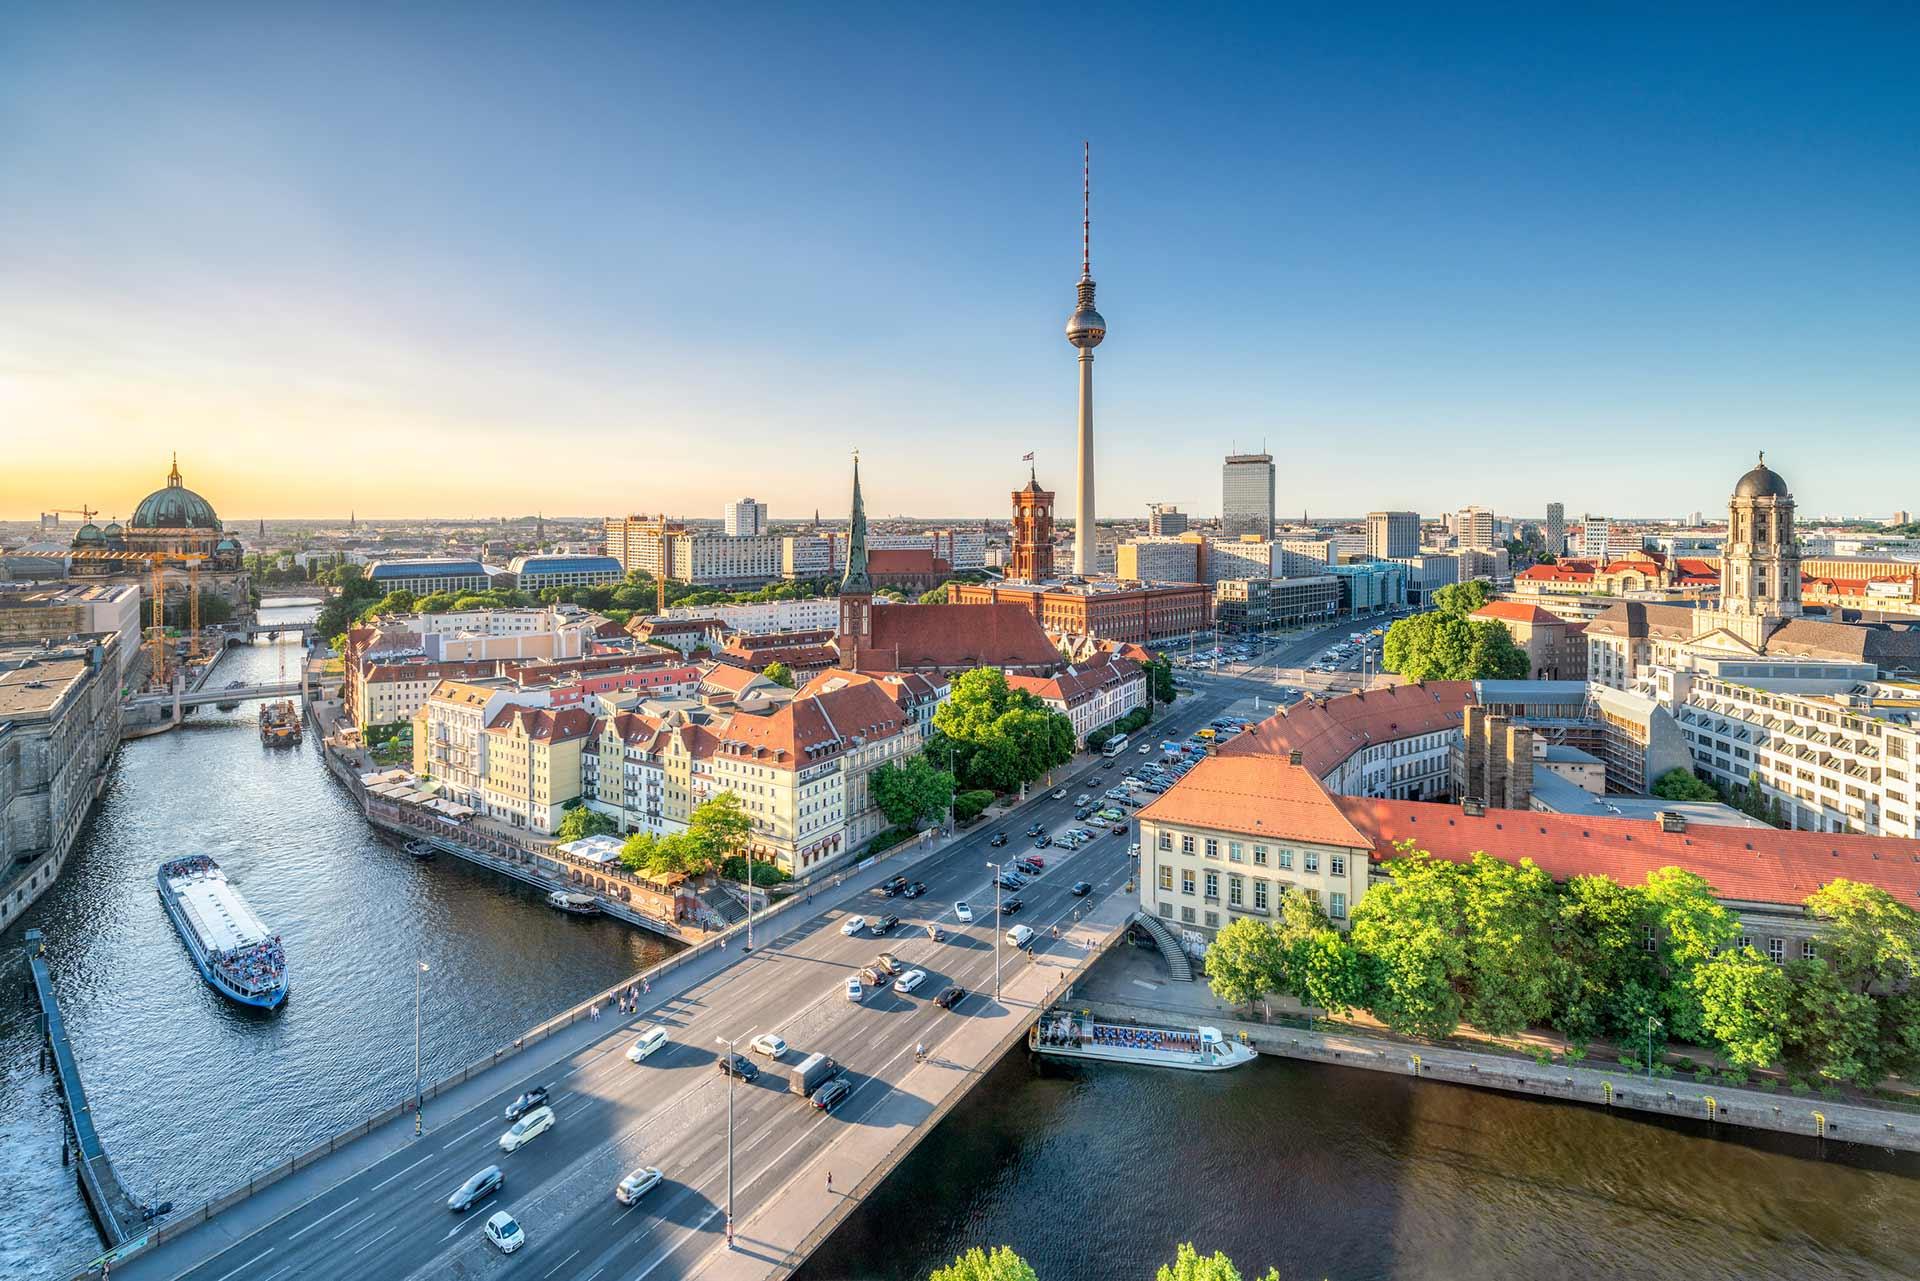 Skyline von Berlin - Gieron & Partner Steuerberatung in Berlin